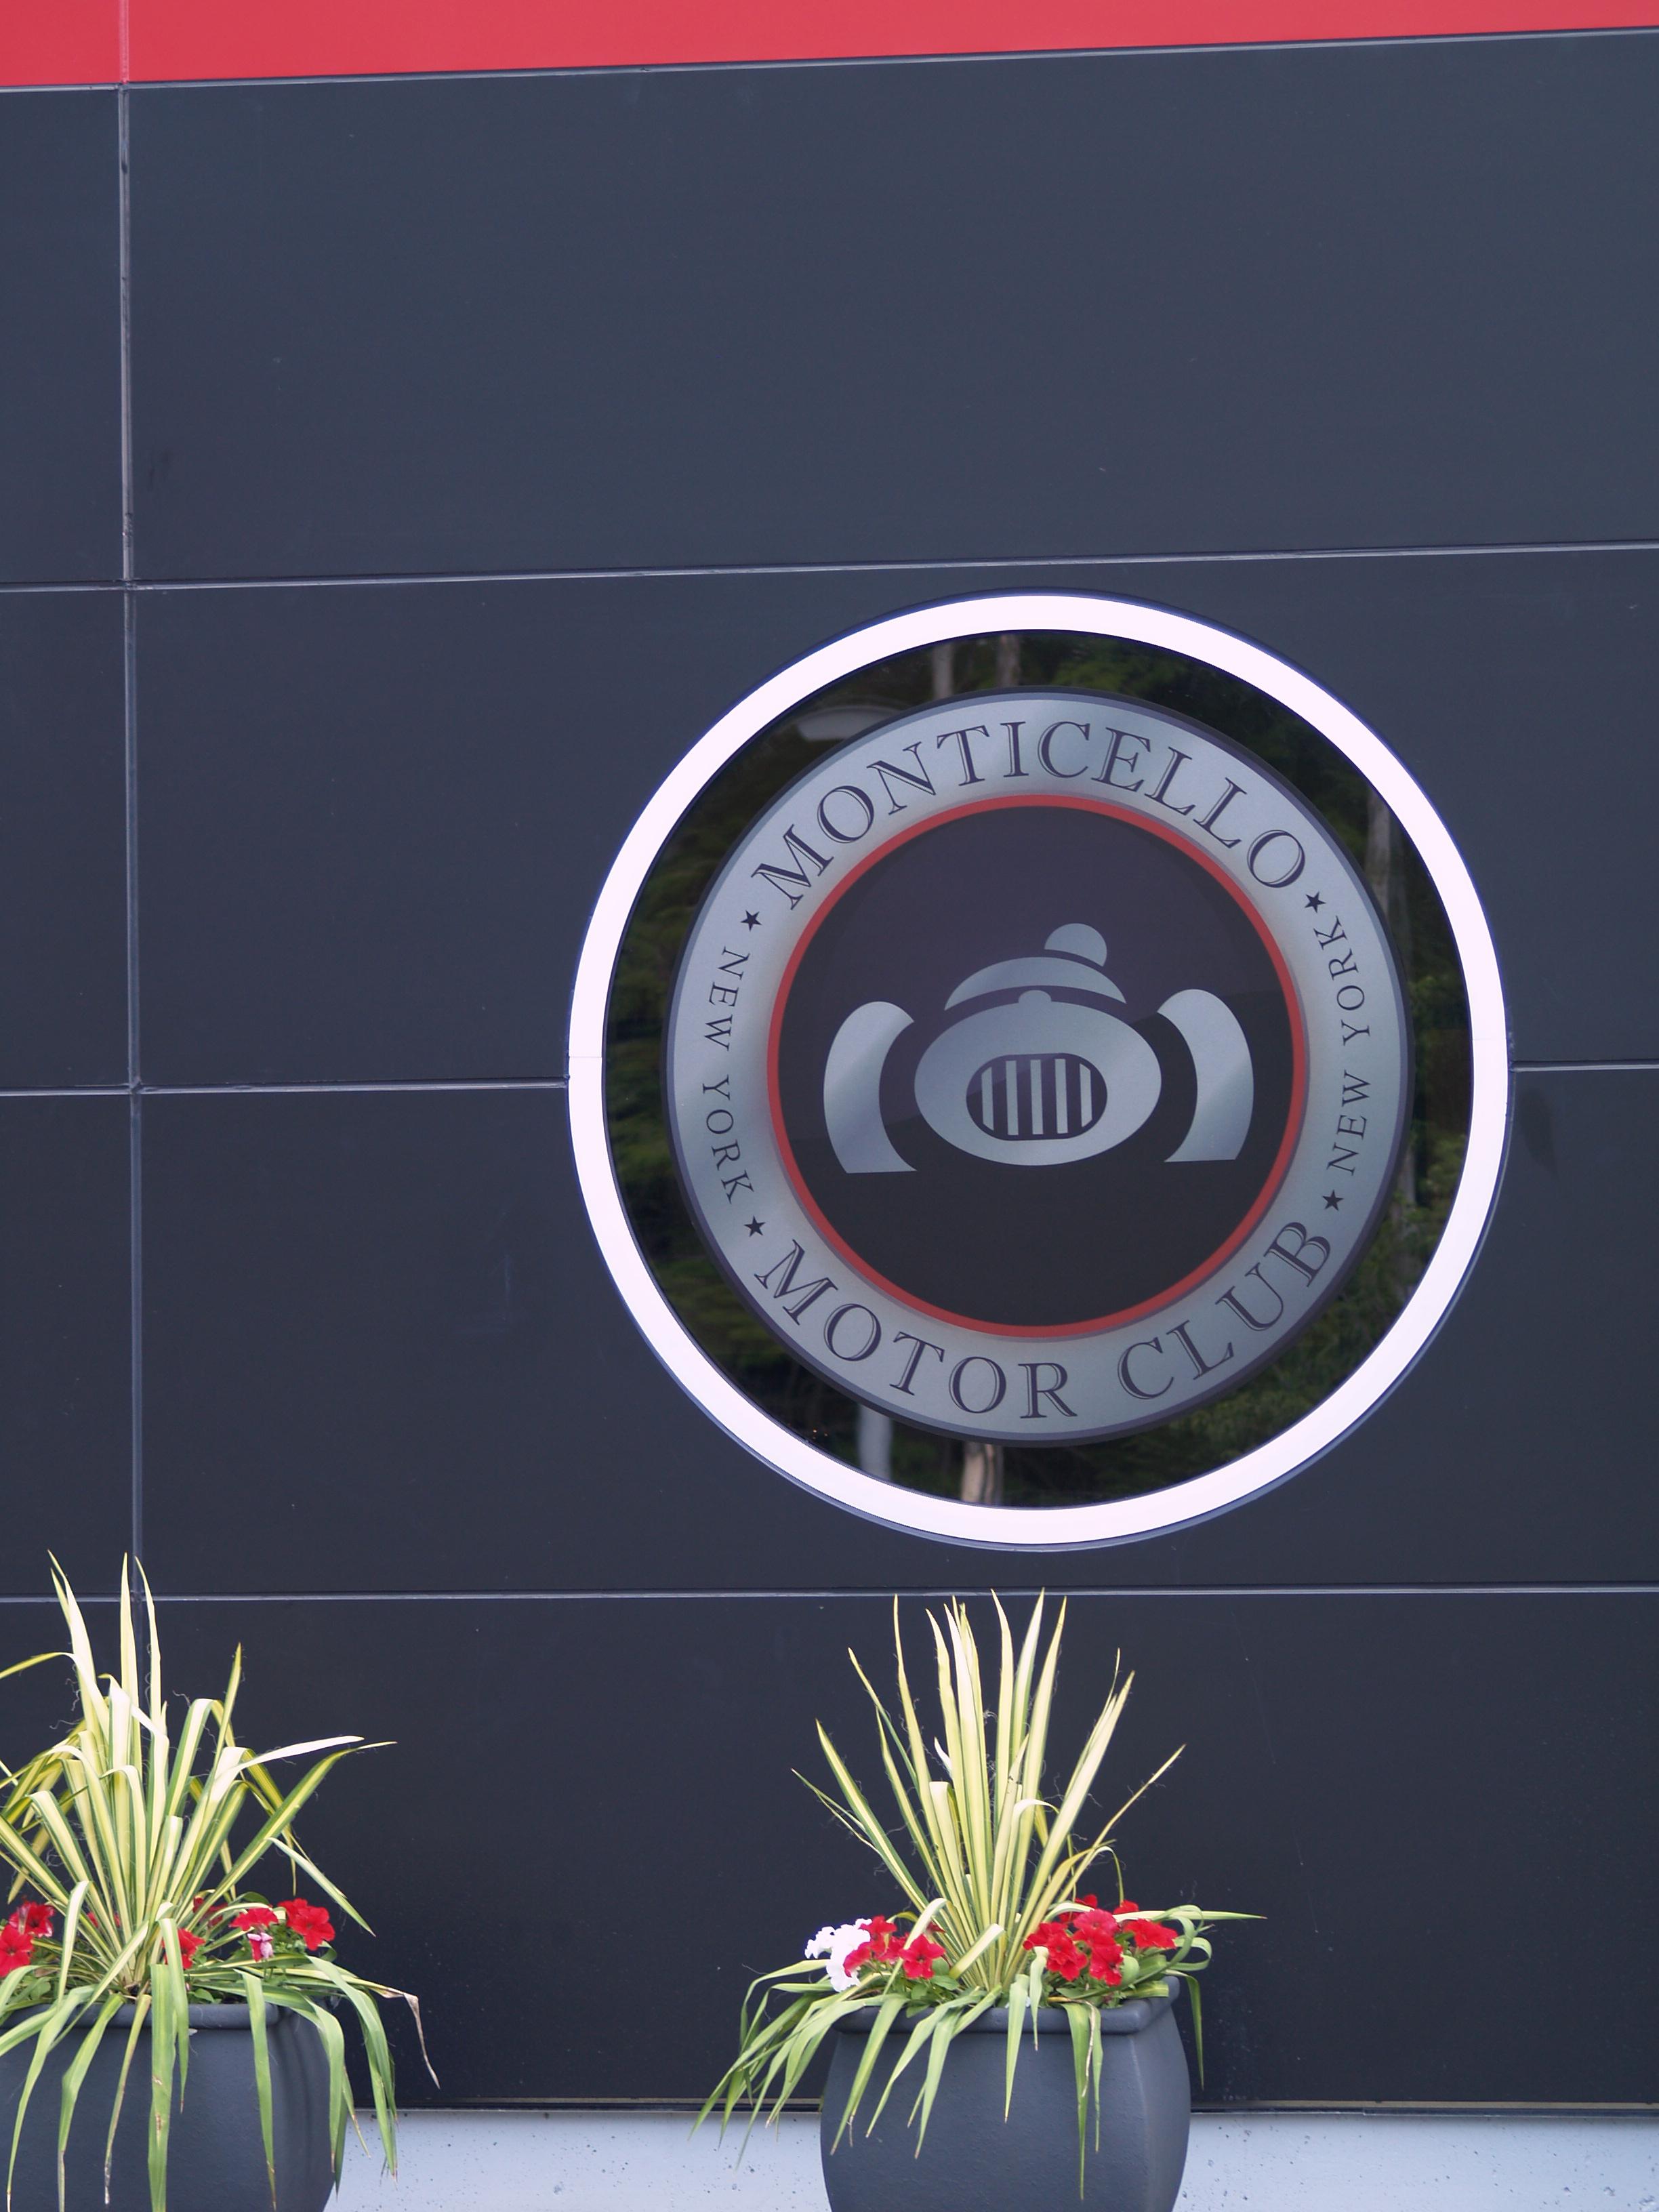 Monticello Motor Club >> Monticello Motor Club K Man Glass Inc